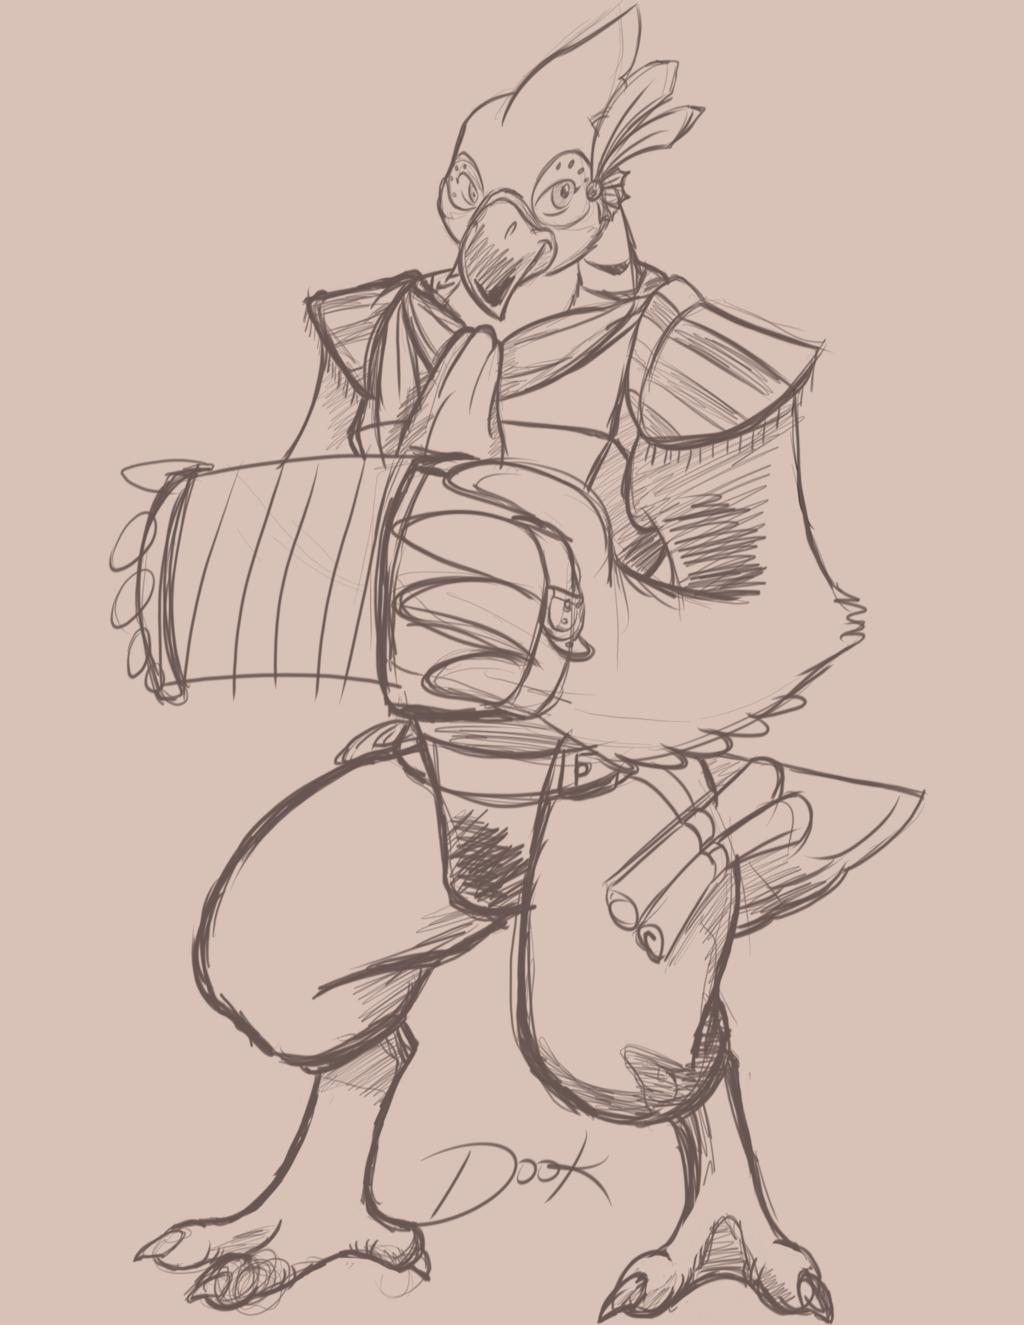 Kass - Warmup Sketch